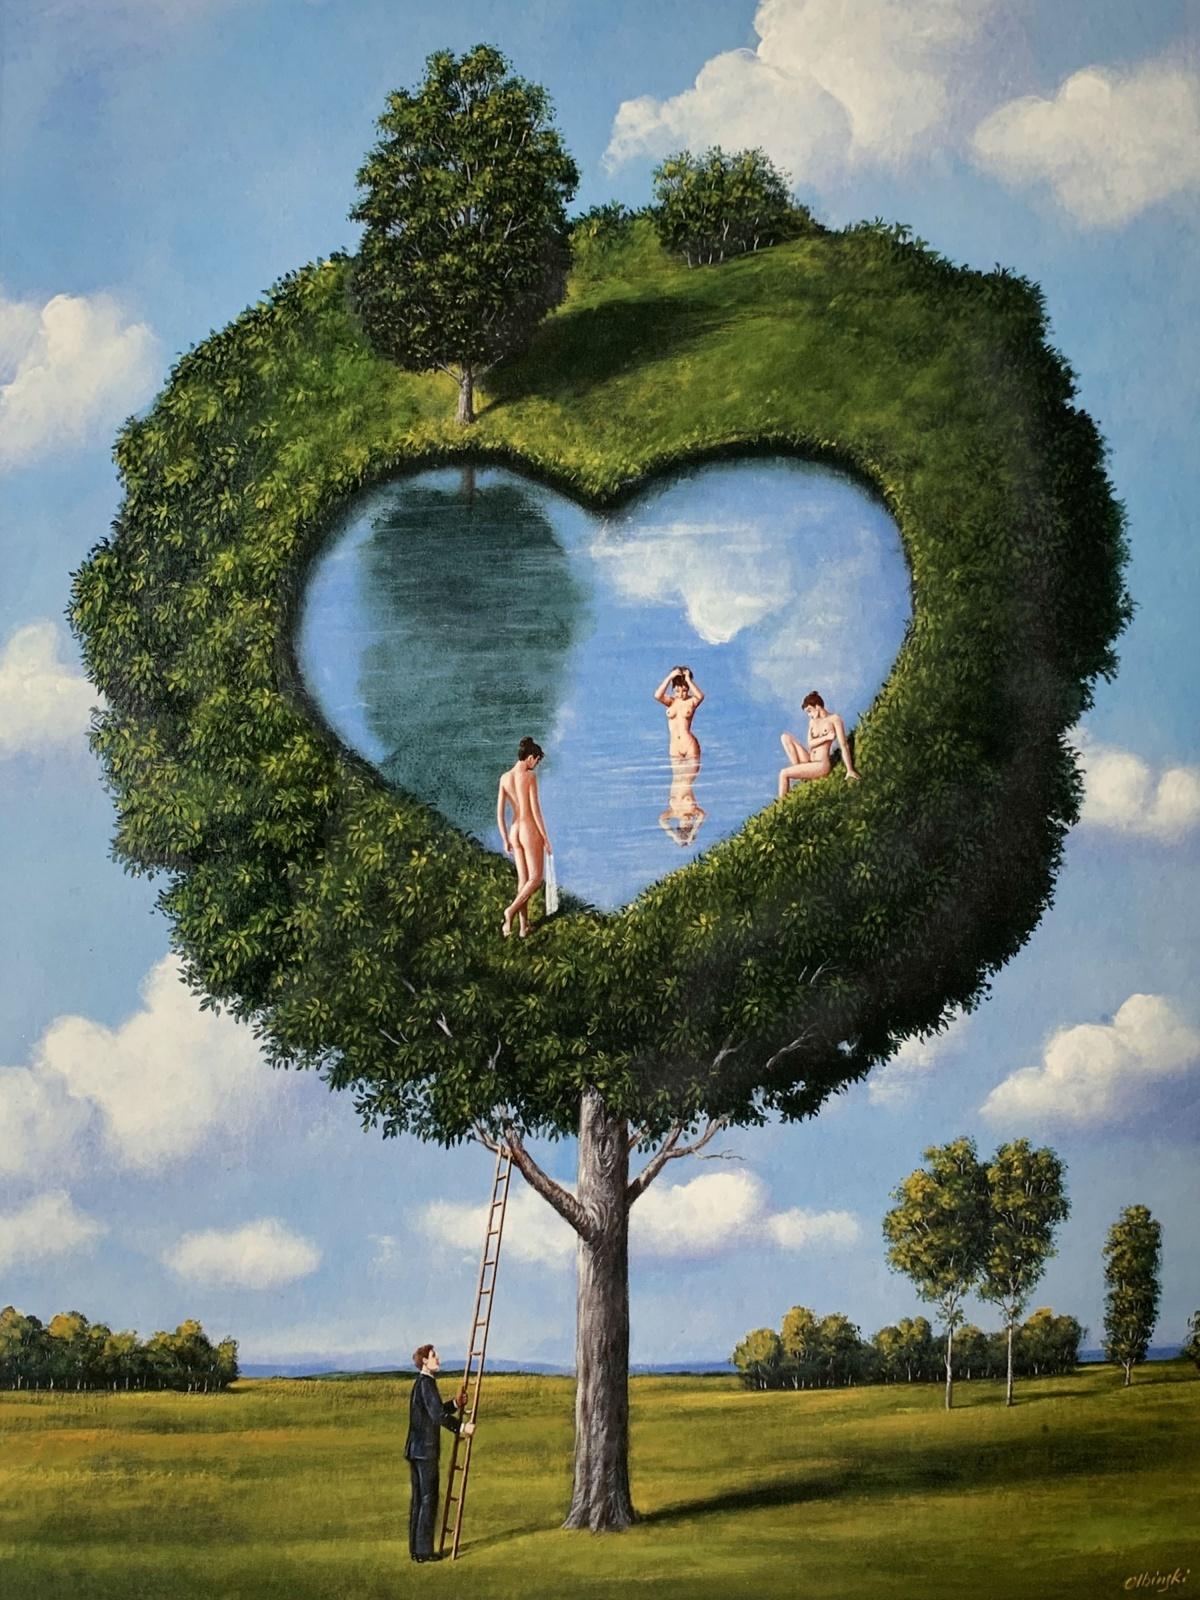 Three Graces - Figurative Surrealist print, Mythology, Landscape, Vibrant colors